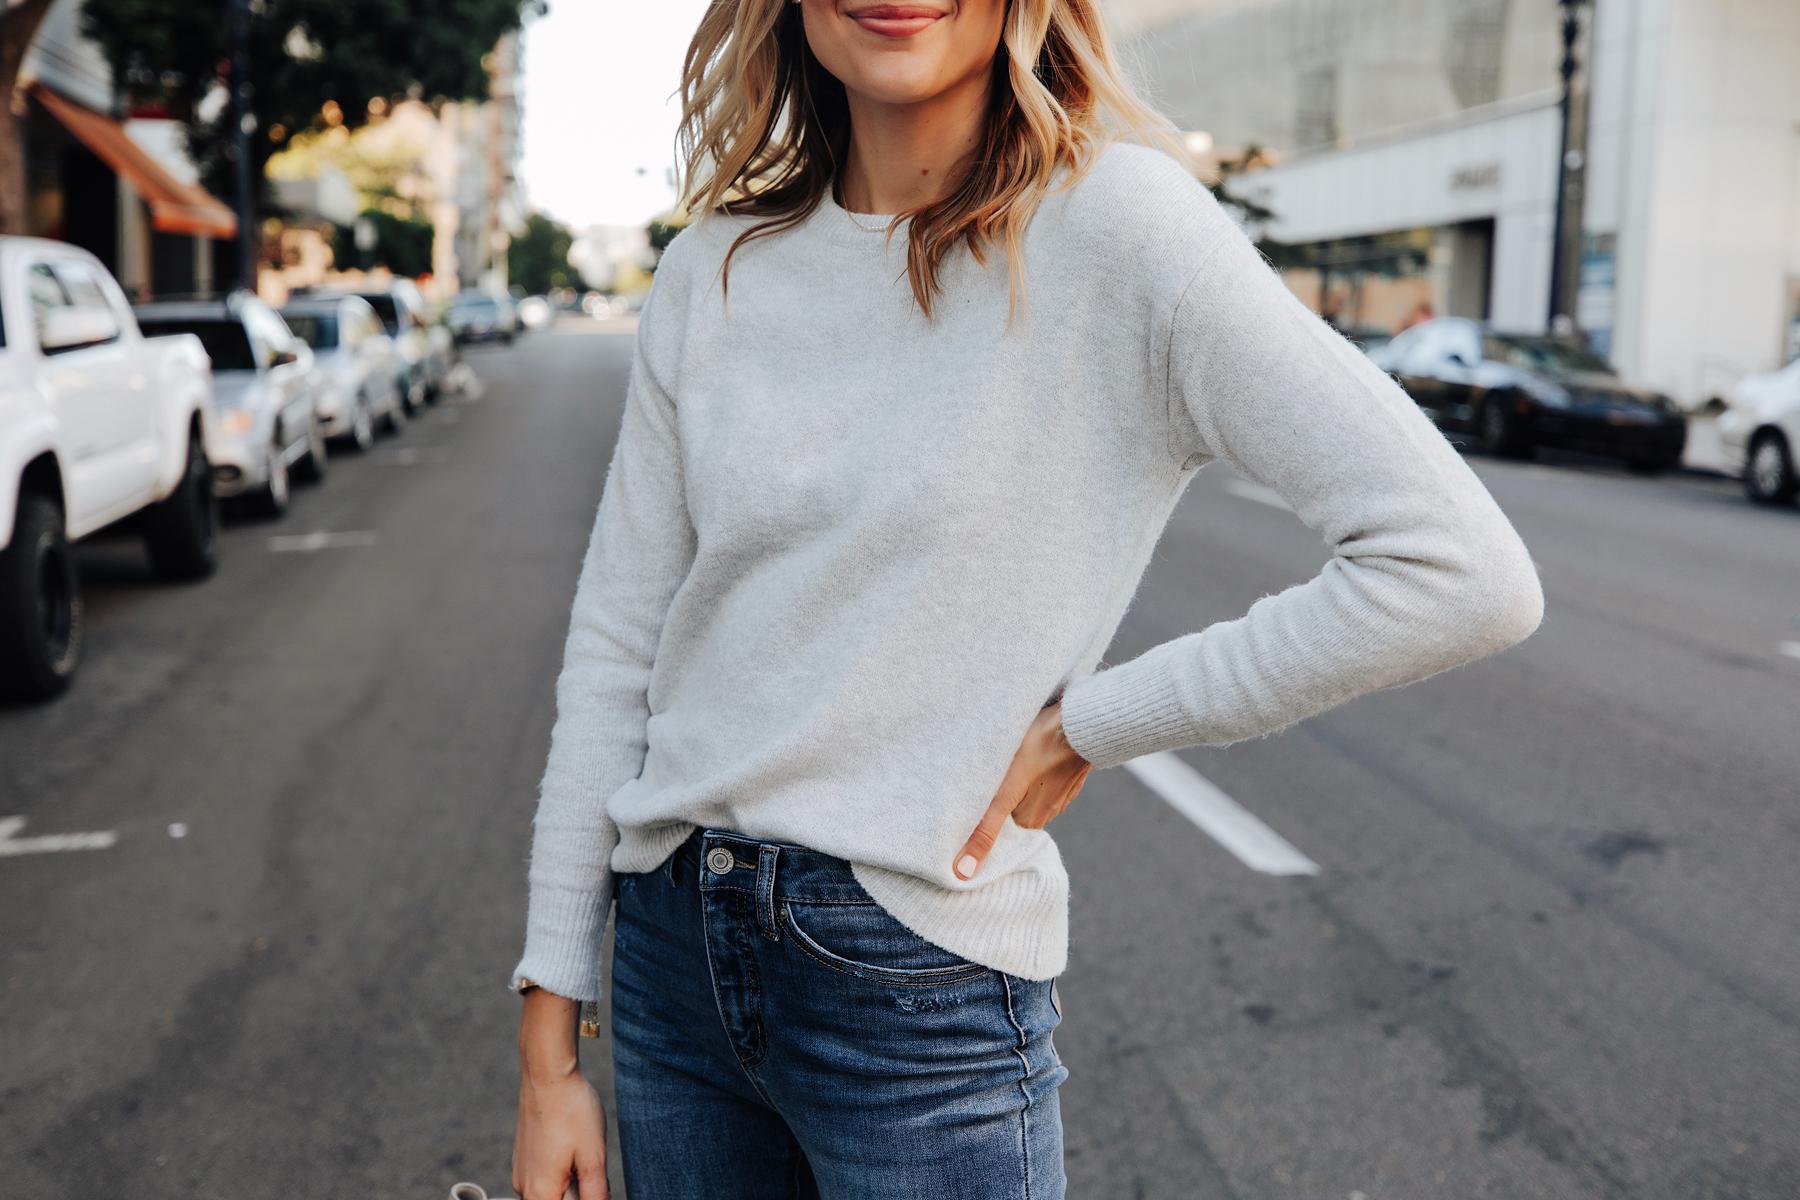 Fashion Jackson Wearing Walmart Grey Sweater Jeans